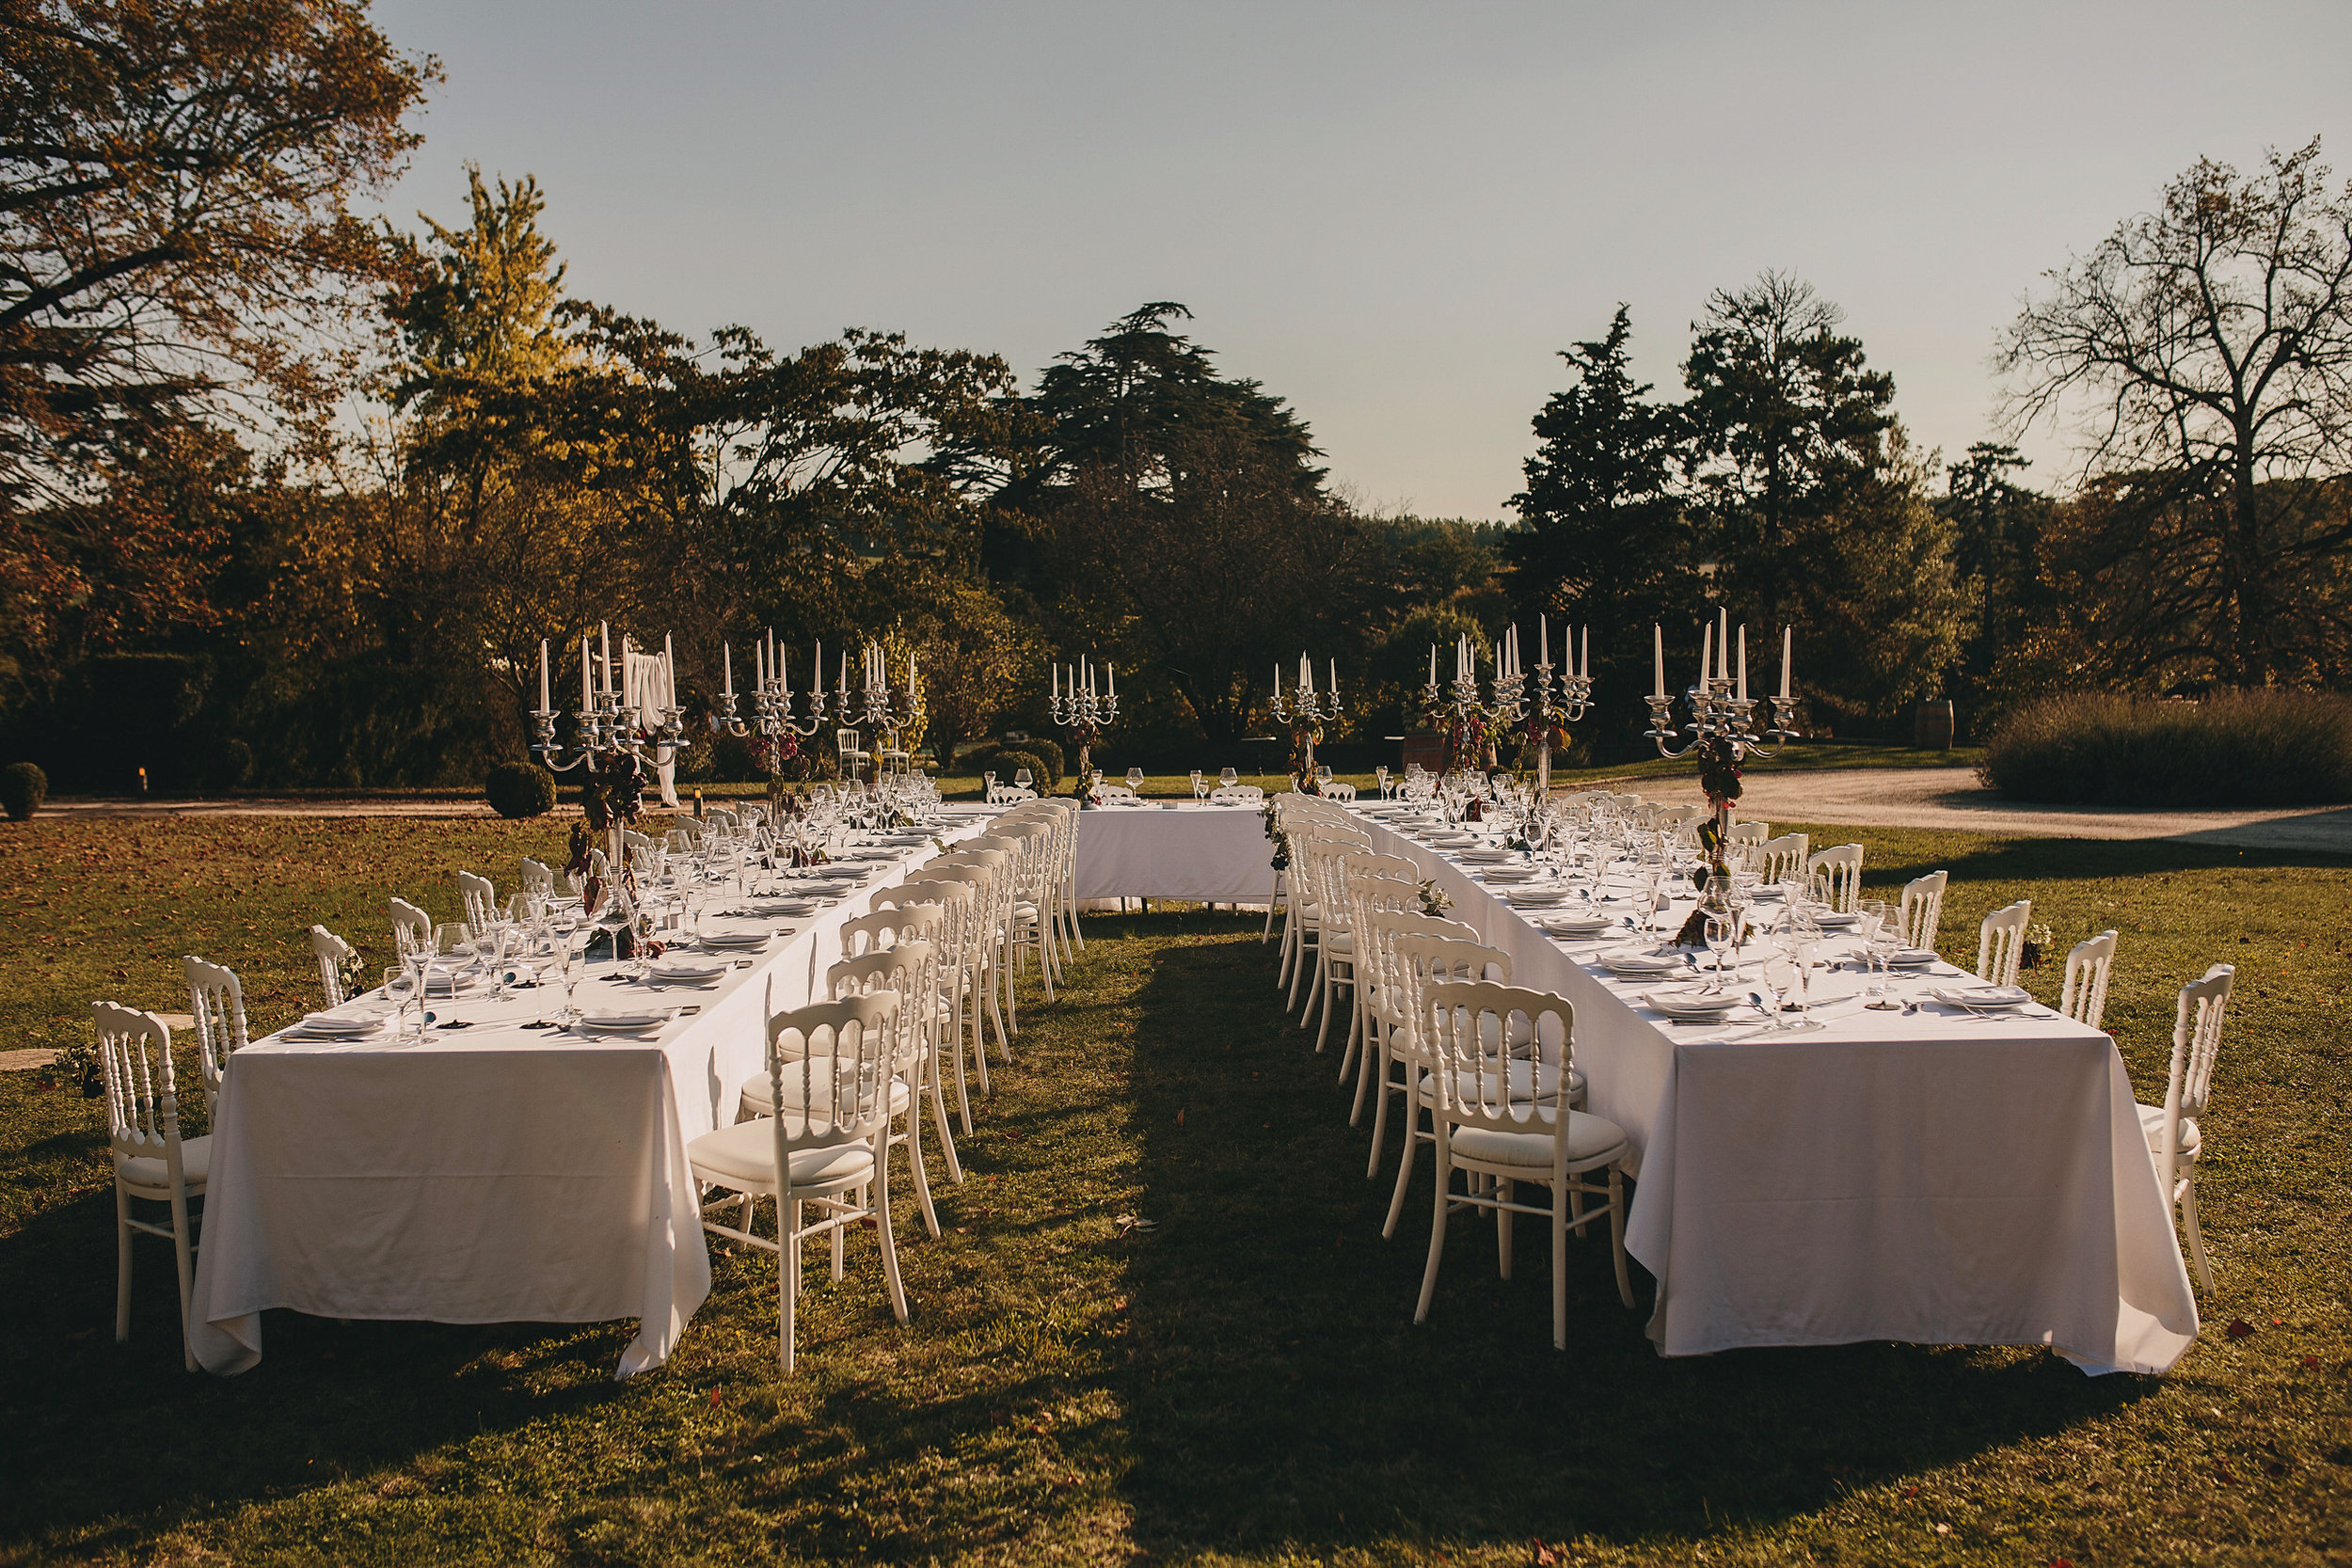 WEDDING PLANNER: YANA AT PEACH PERFECT WEDDINGS  PHOTOGRAPHER: SAŠA ADAMOVIĆ